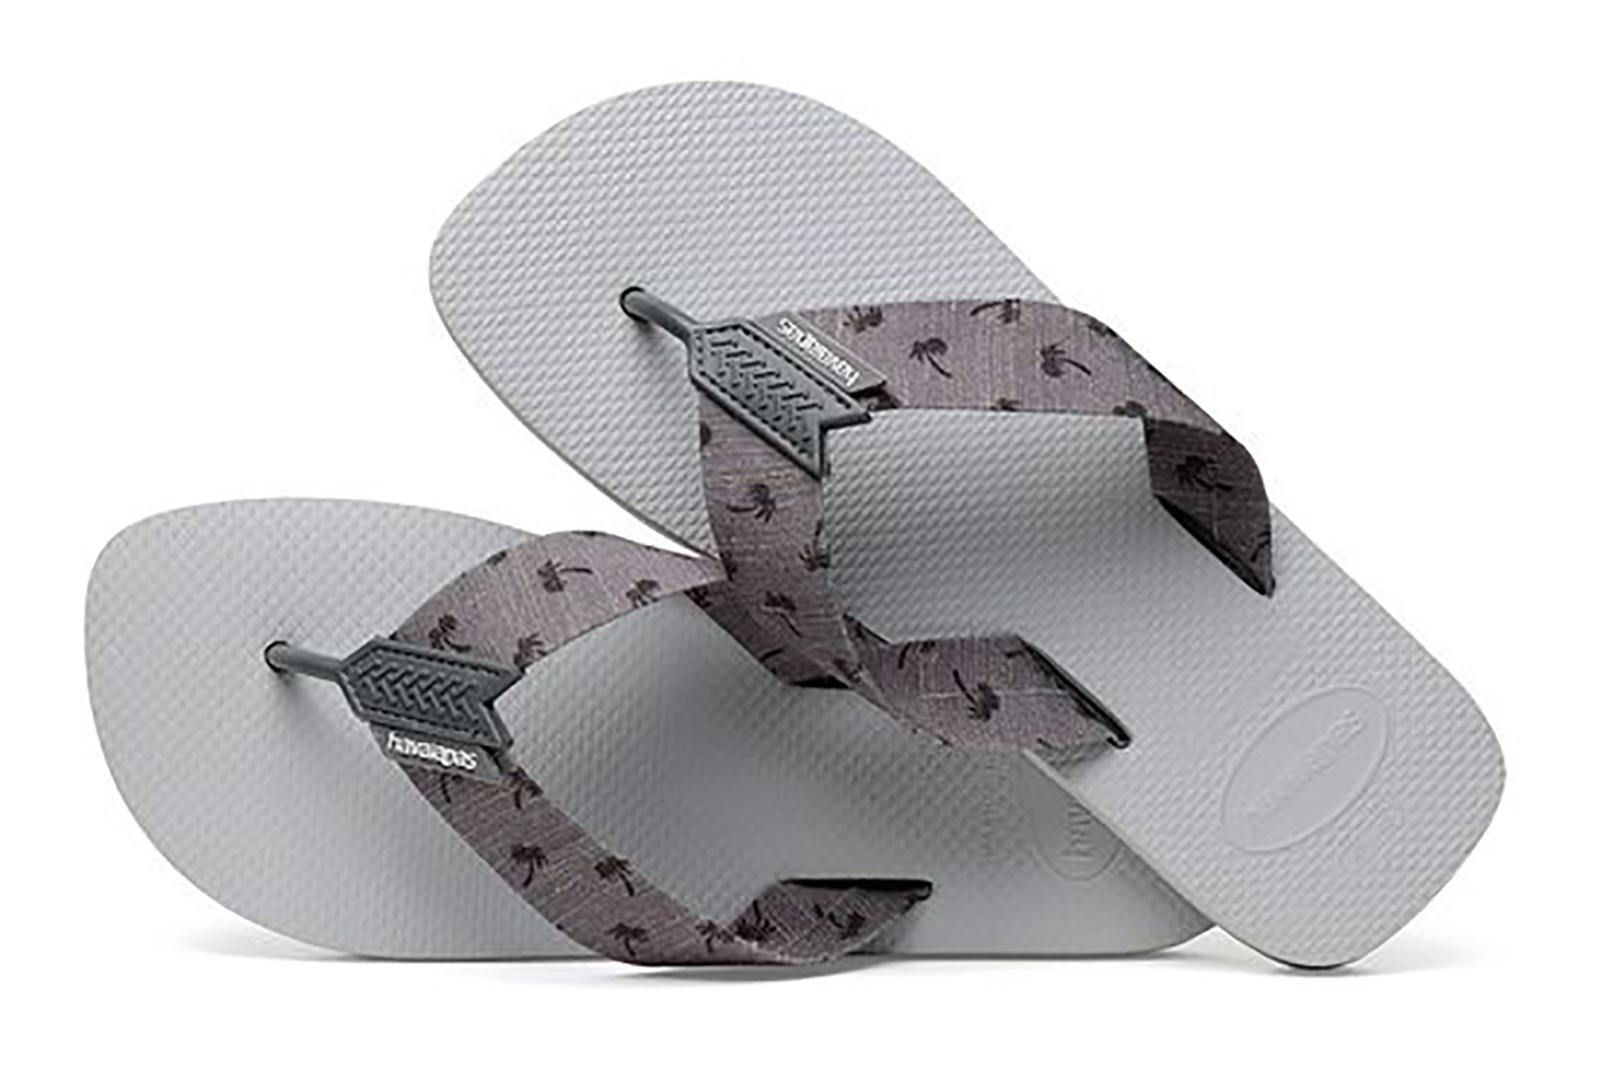 767c71c61c4d Flip-Flops Urban Series Ice Grey-grey - Brand Havaianas